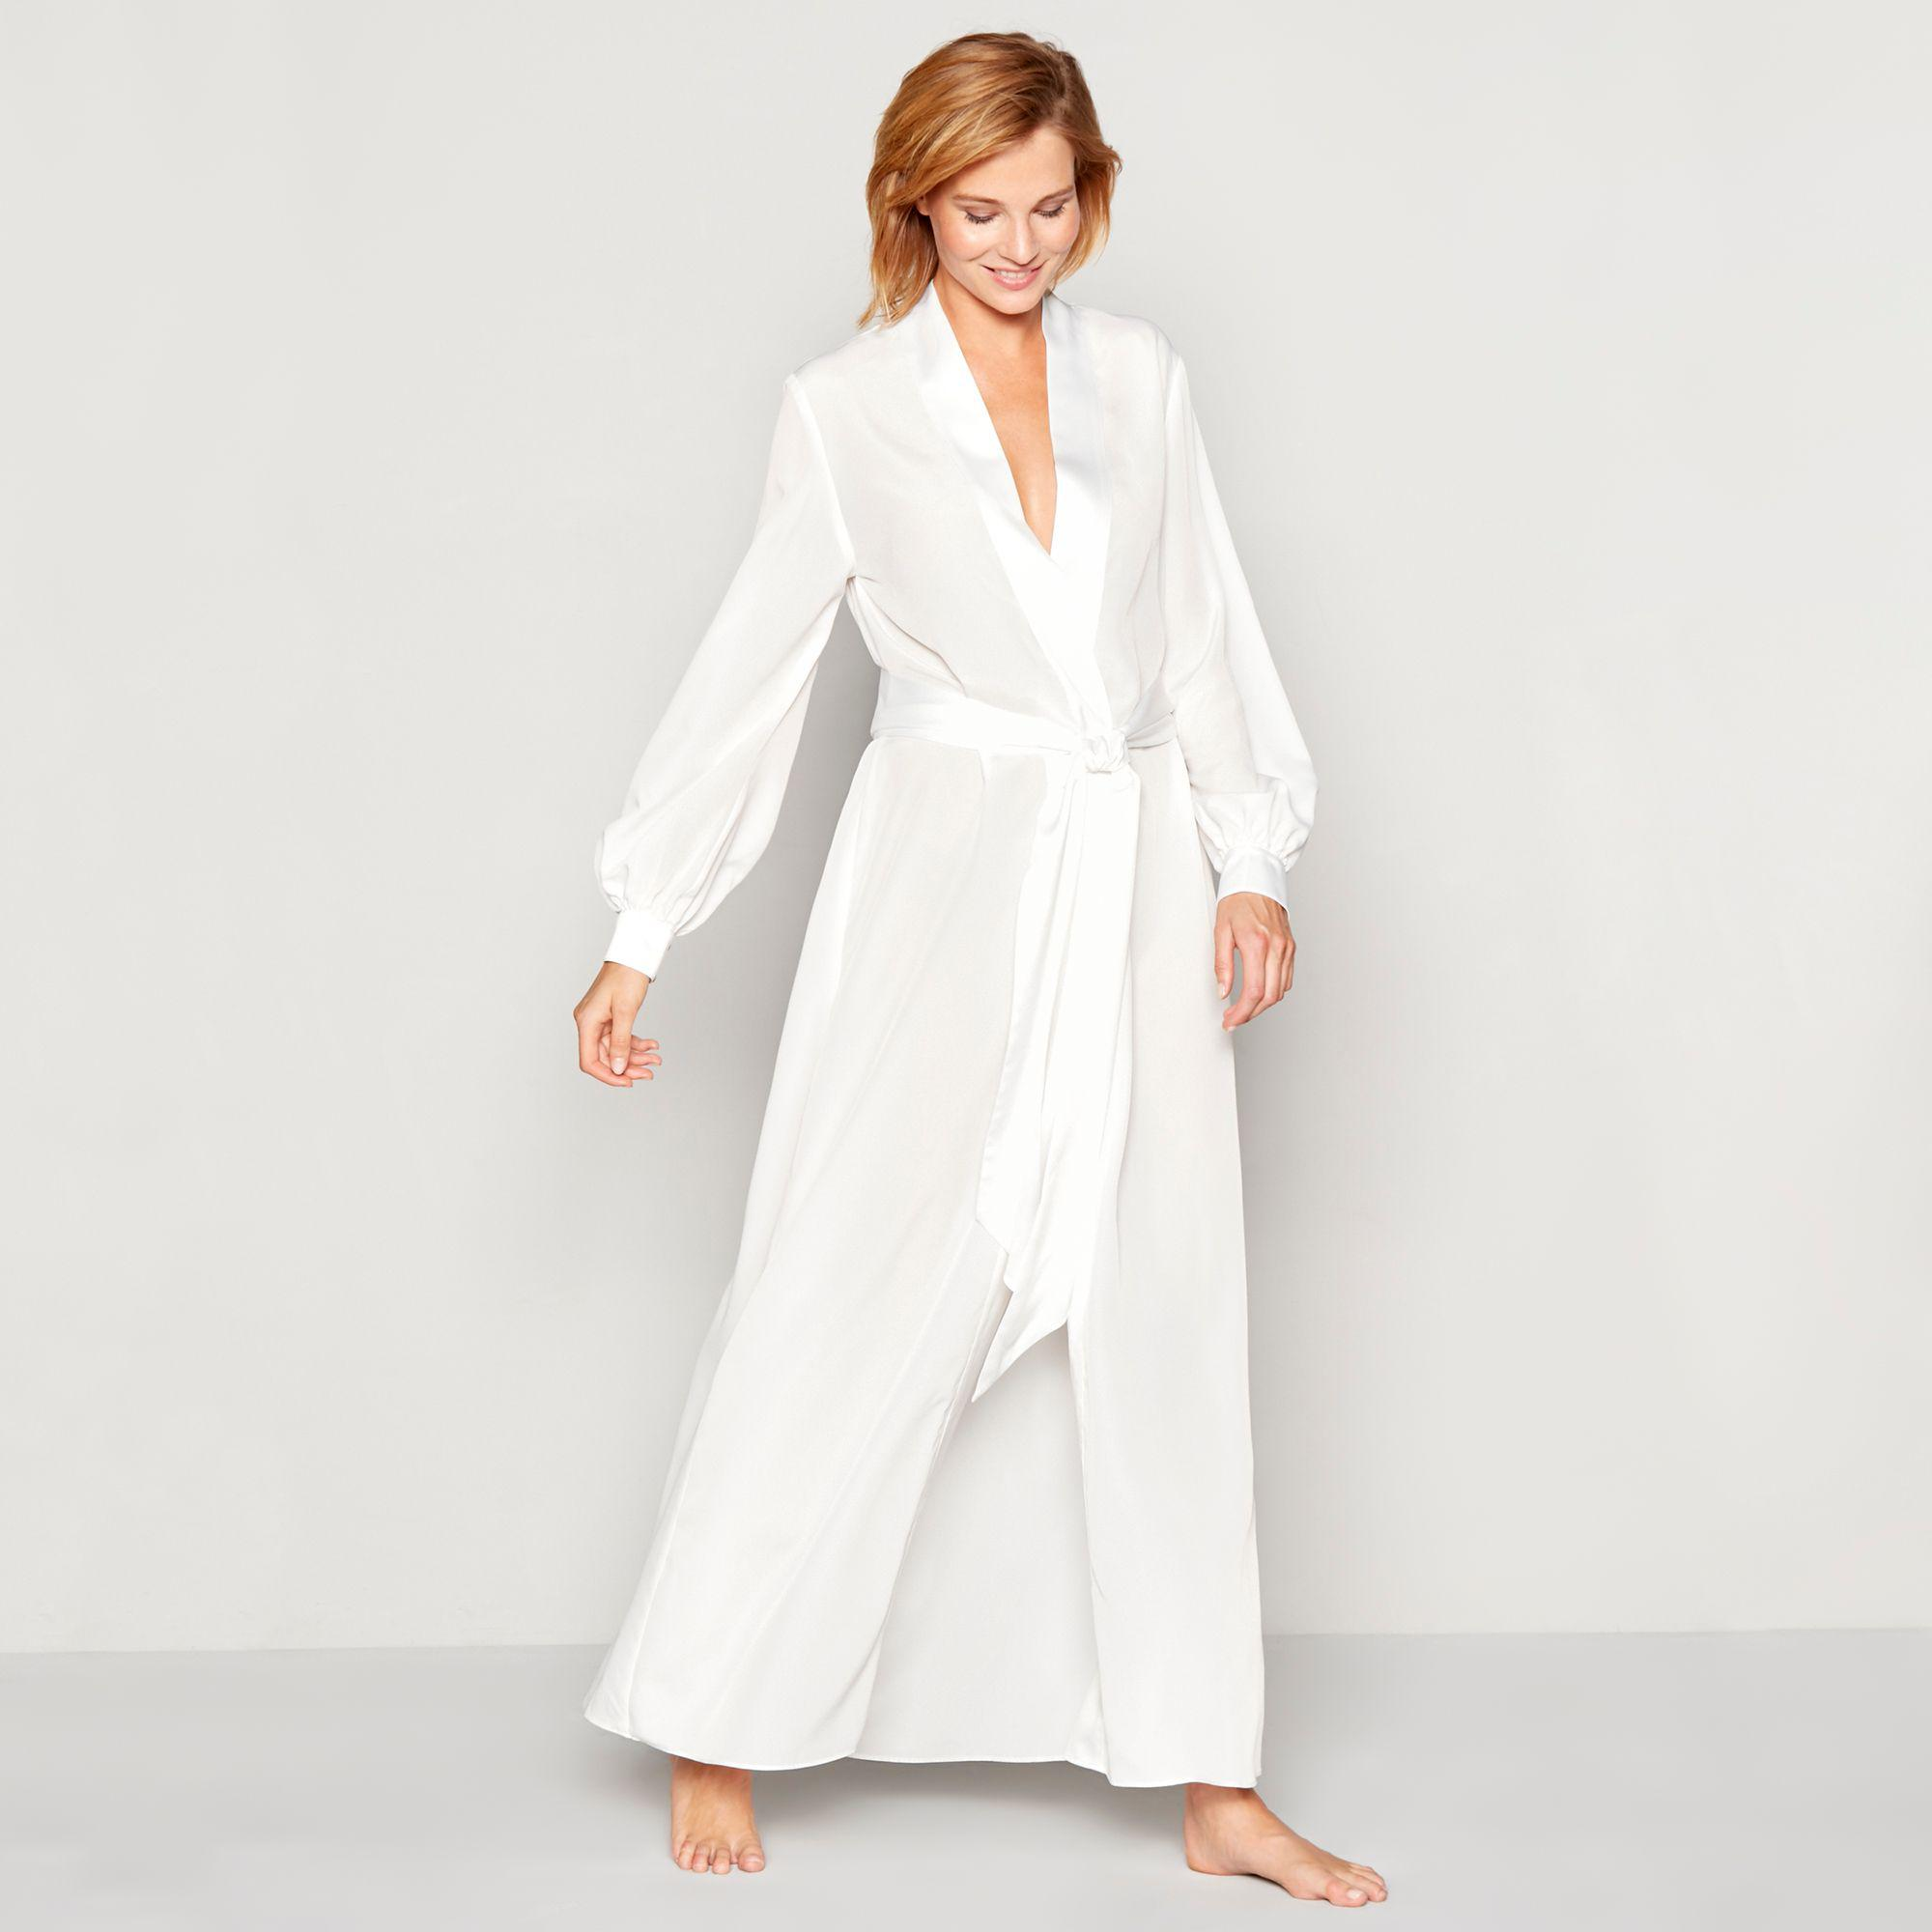 Jenny Packham Ivory Bridal Chiffon Satin Dressing Gown in White - Lyst 29710db6c